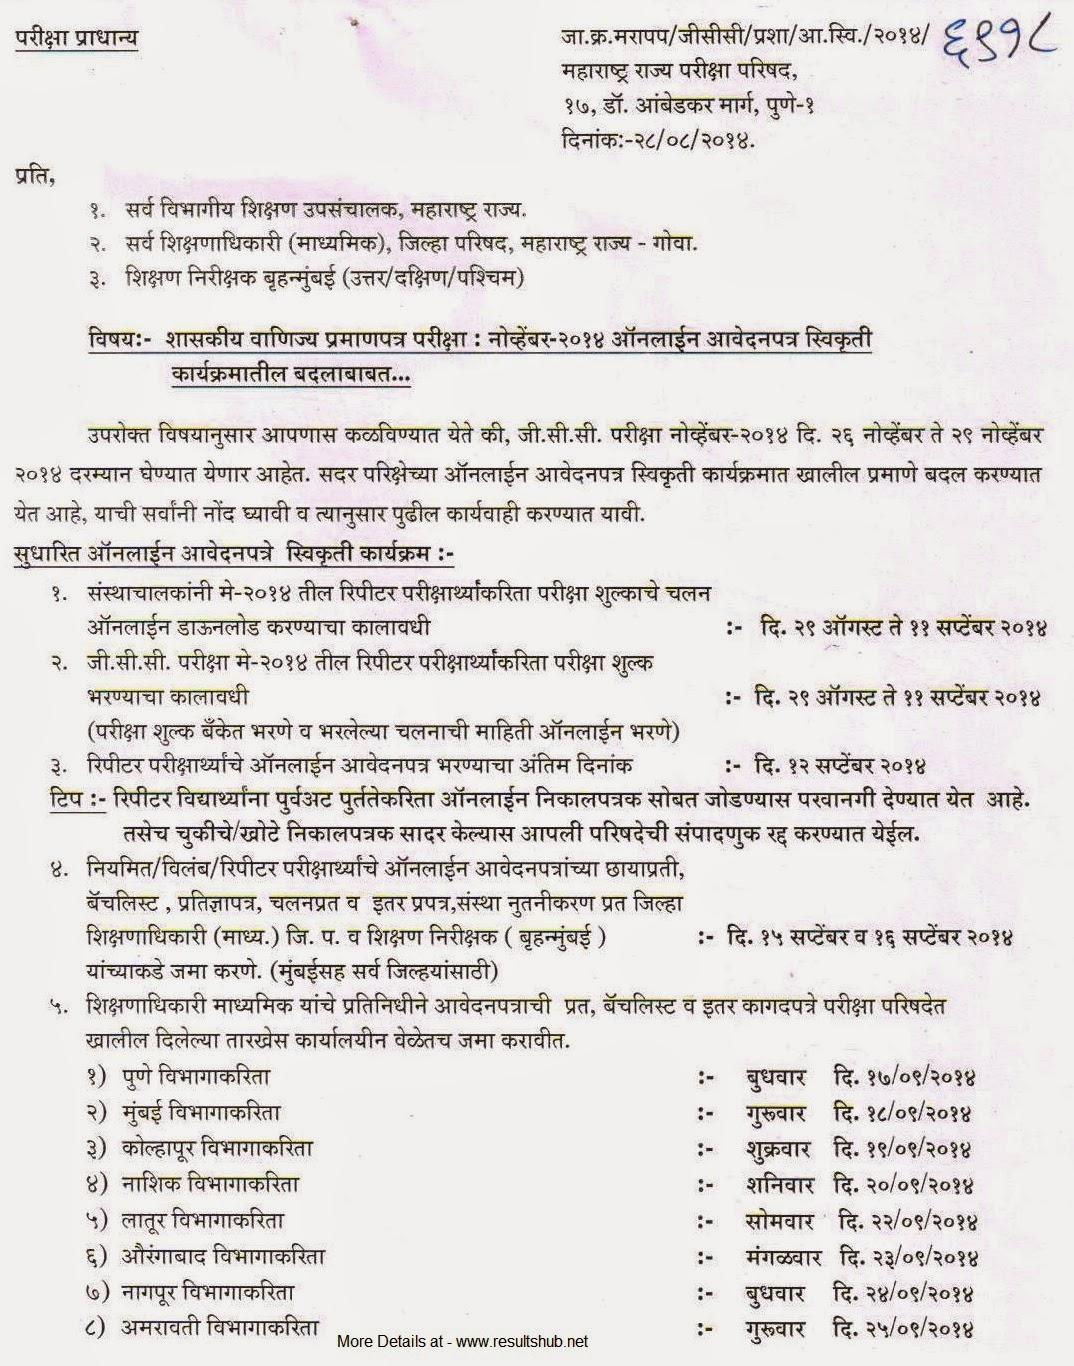 union bank of india mi road jaipur contact no